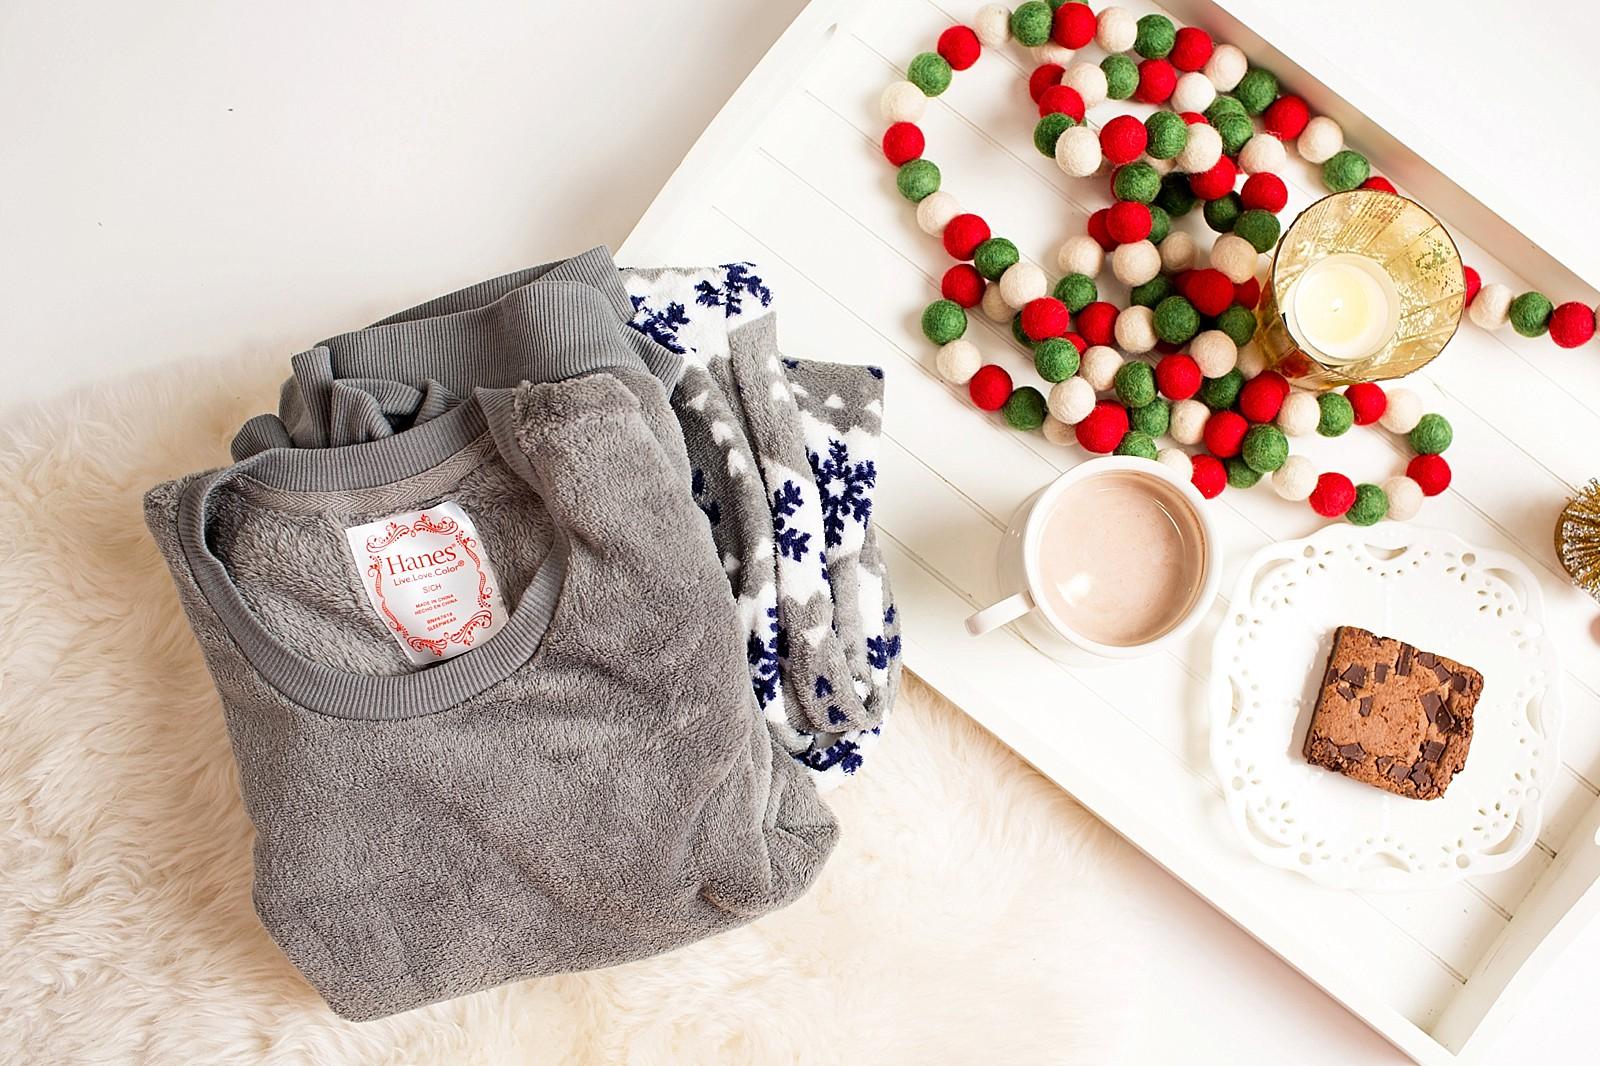 hanes-christmas-pajamas-girls-pajama-party-ideas-cute-jammies-diana-elizabeth-lifestyle-fashion-blogger-phoenix-arizona-1756